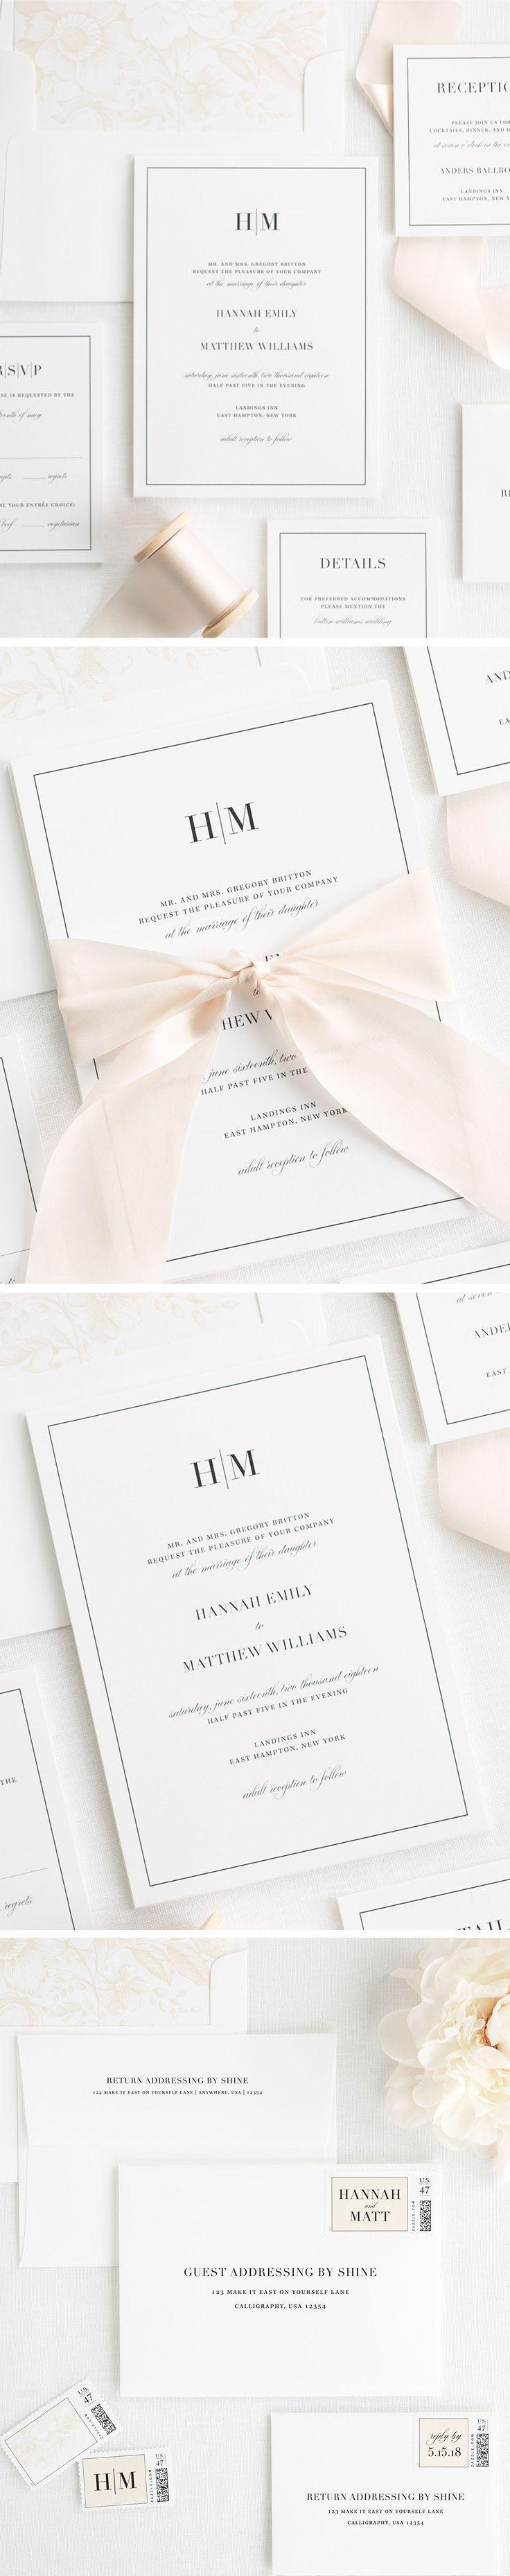 best 25 monogram wedding invitations ideas on pinterest